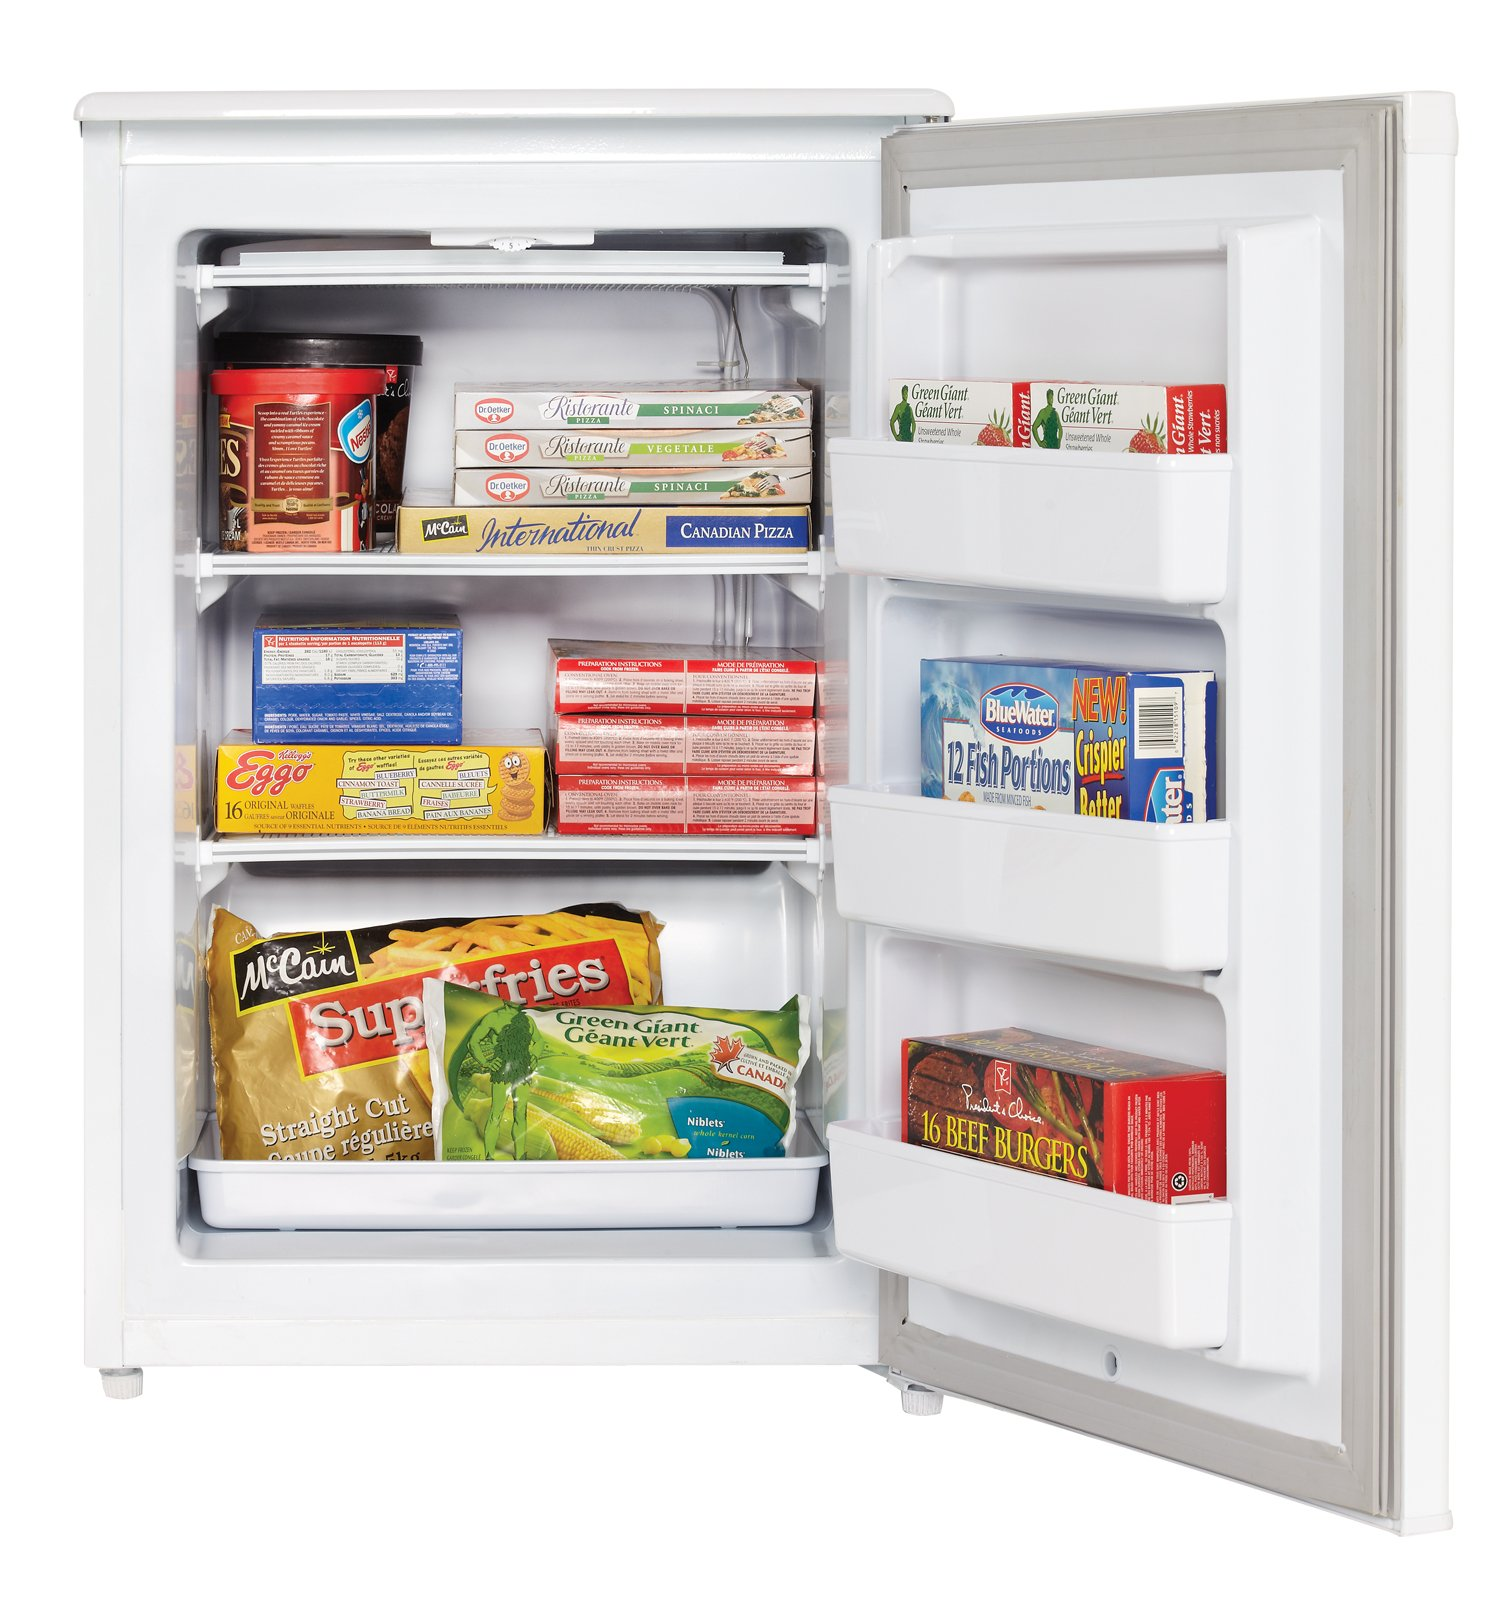 Danby DUFM043A1WDD 4.3 Cubic Feet Upright Freezer, White by Danby (Image #6)